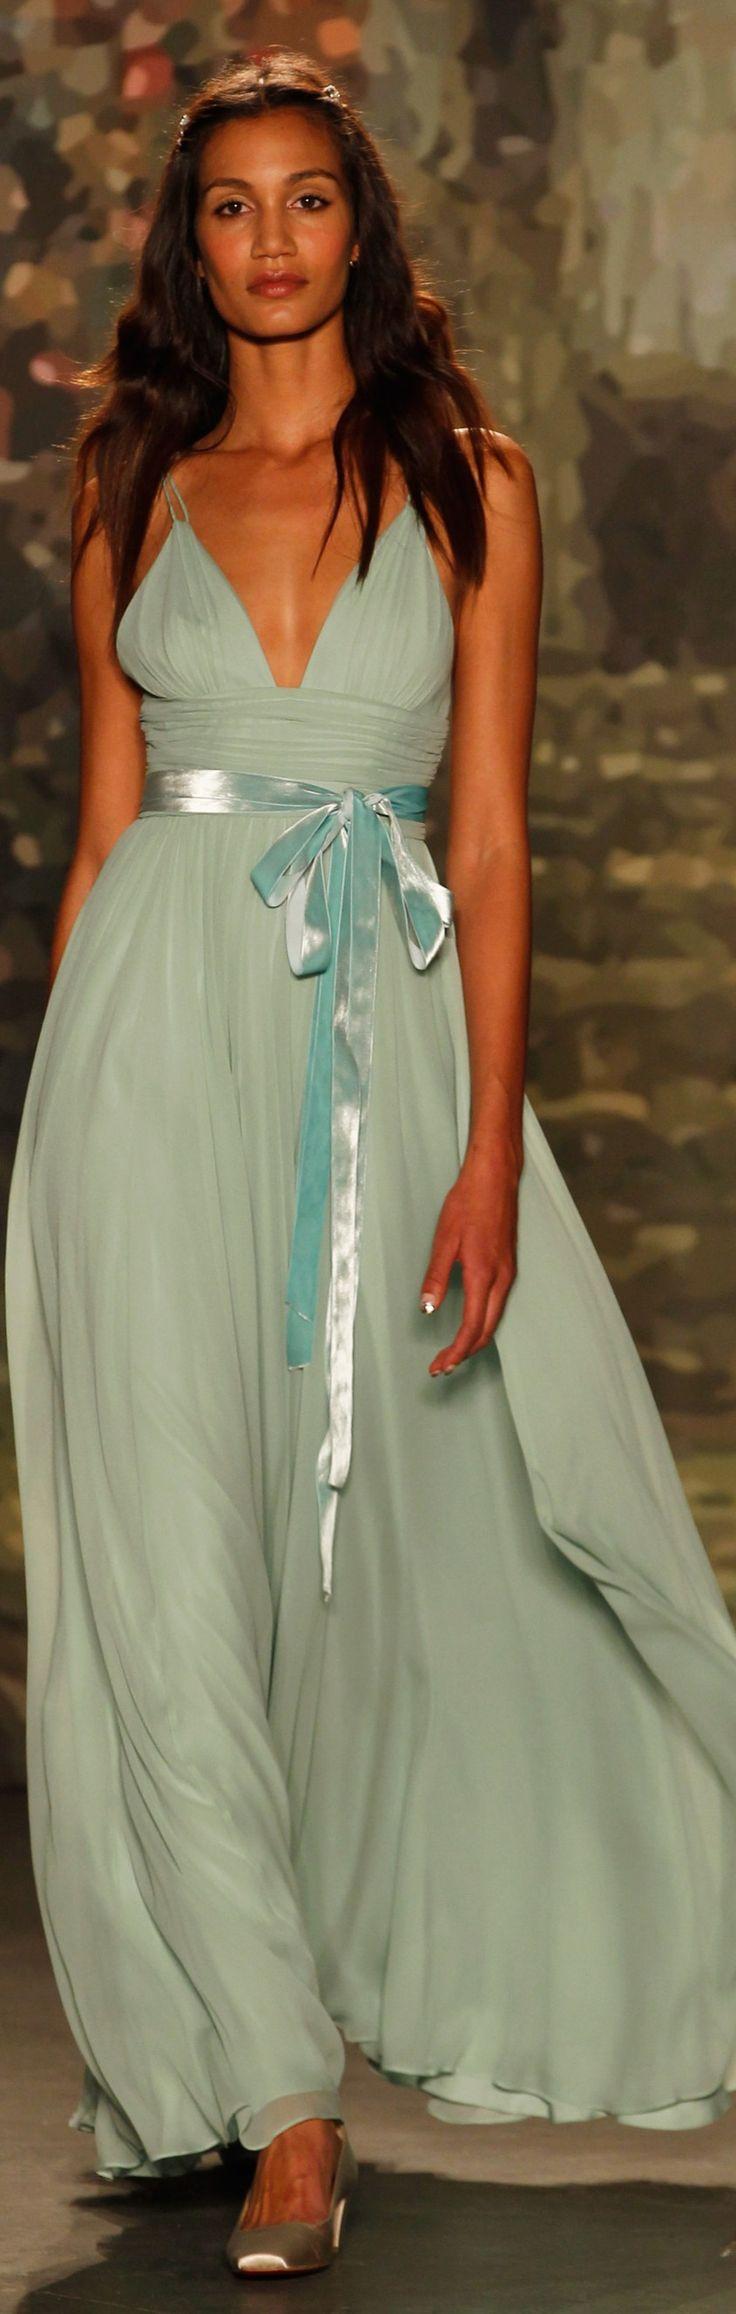 Jenny Packham ~ Mint Green Chiffon Bridal Gown, Spring 2016